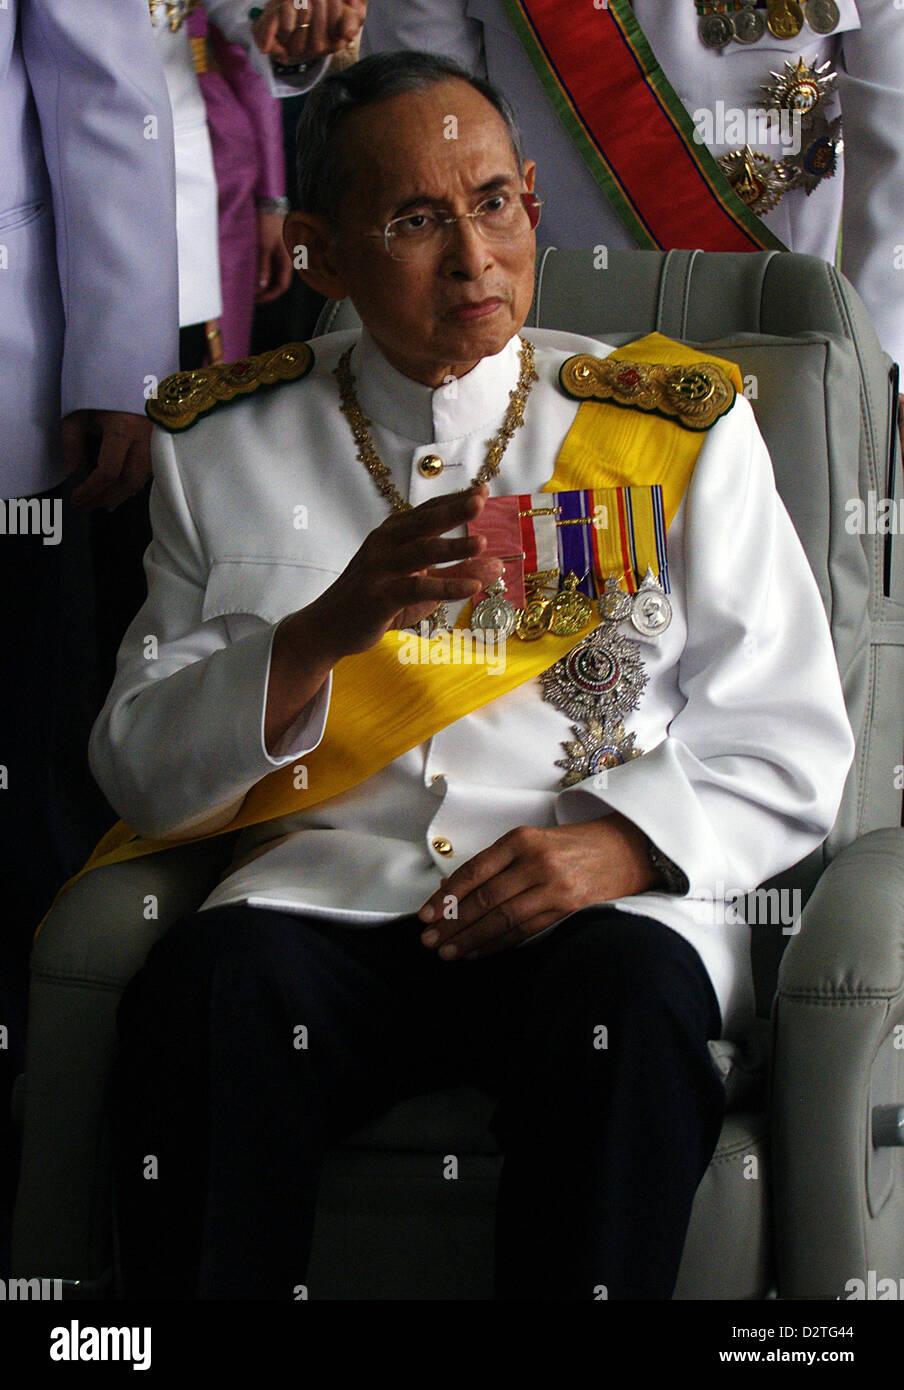 Thailand's monarch Bhumibol Adulyadej leaves Siriraj Hospital on December 5, 2009, before going to the Royal - Stock Image